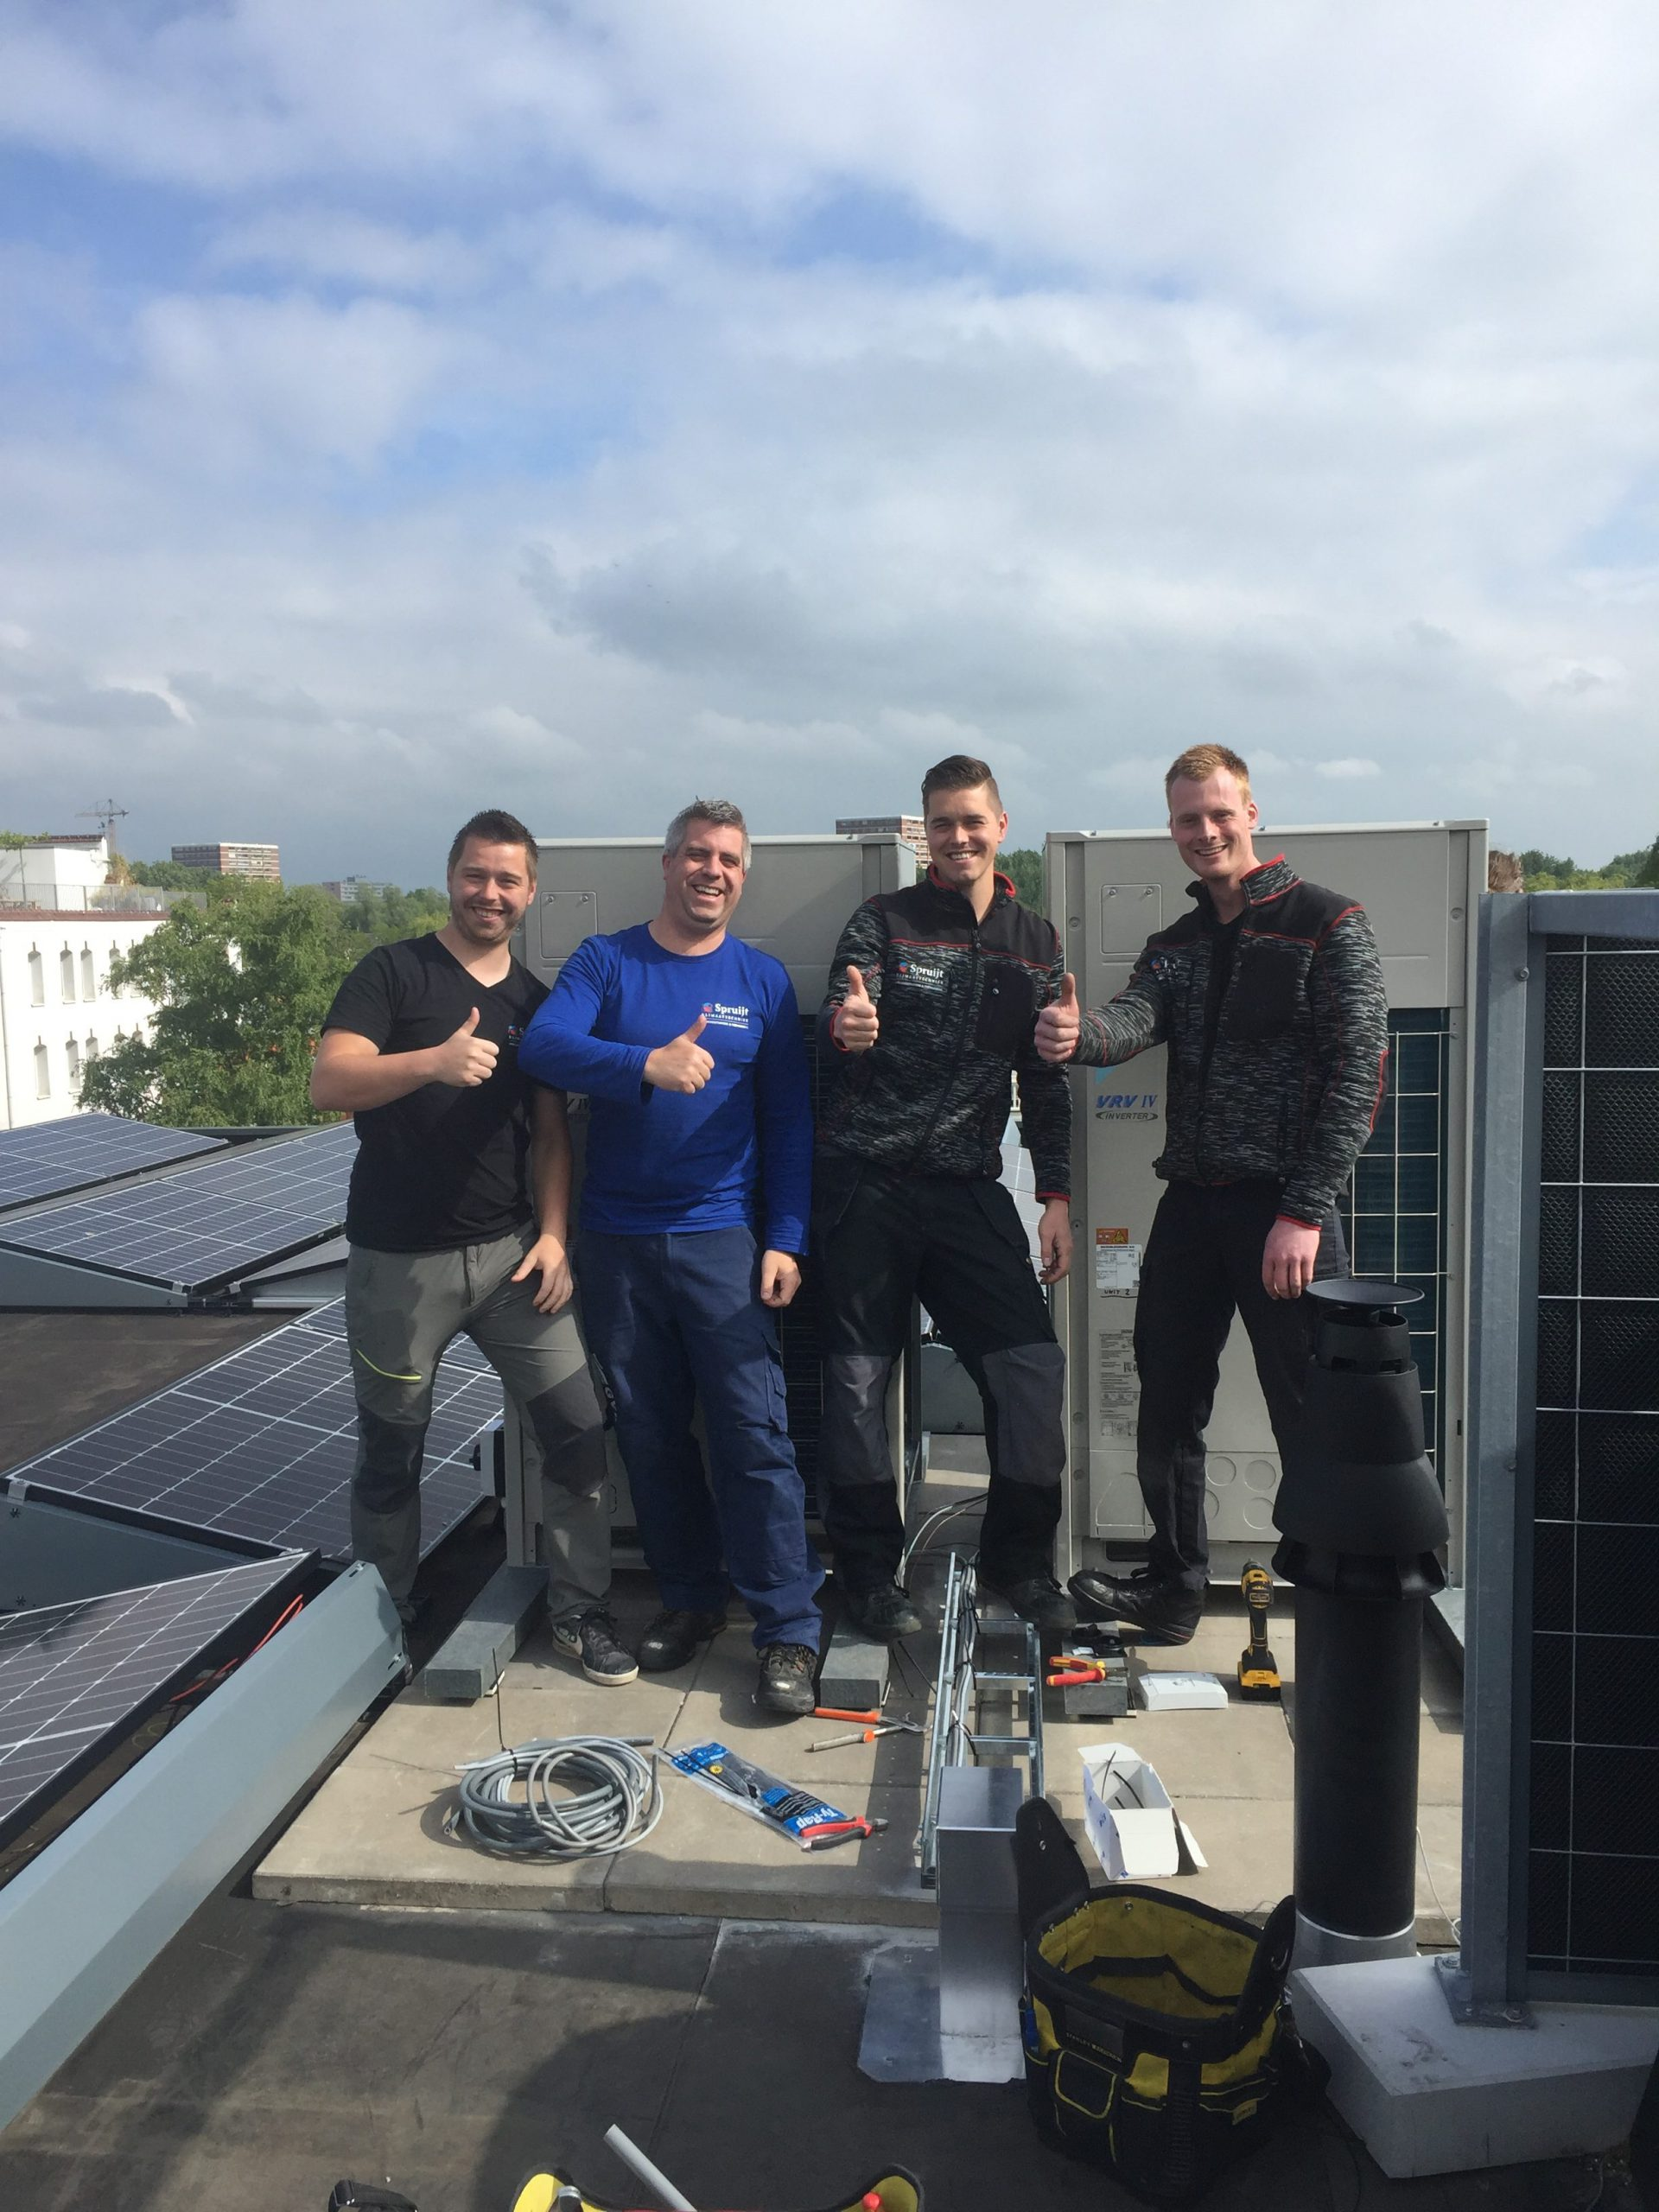 Spruijt Klimaat - Team Spruijt Klimaattechniek medewerkers airco Amsterdam